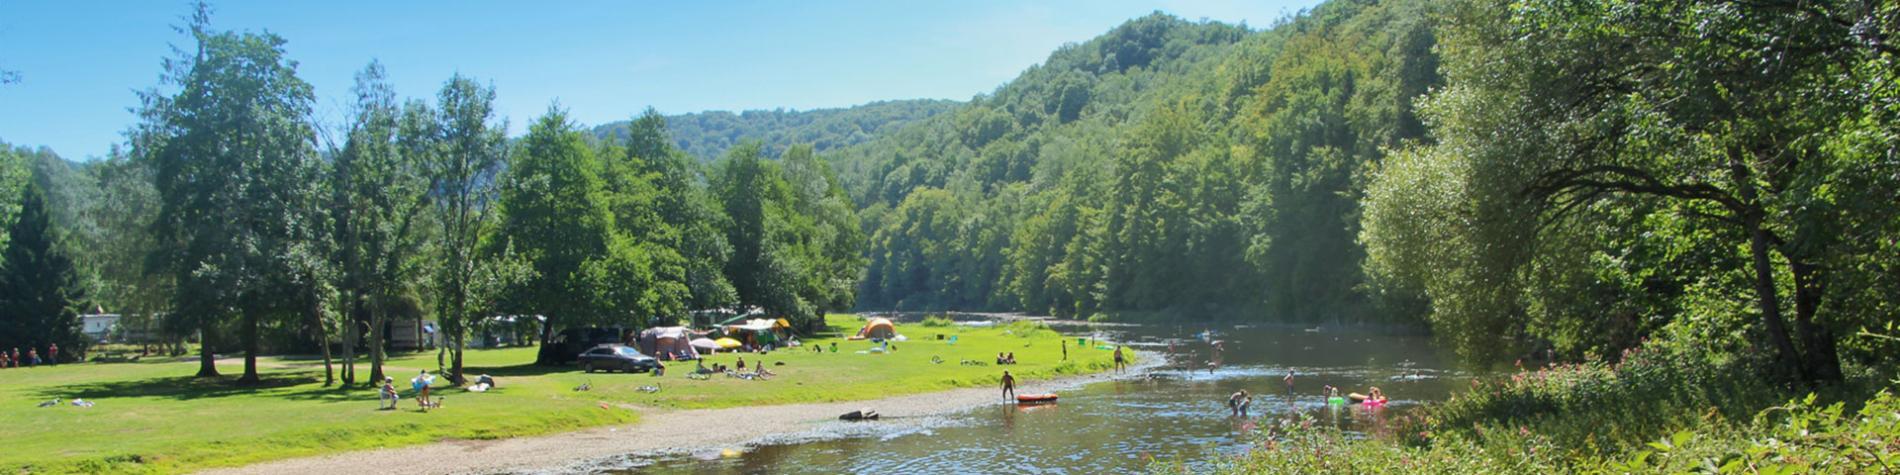 camping en Wallonie - camp - campement - bivouac - aire touristique - nature - camping d'Houlifontaine